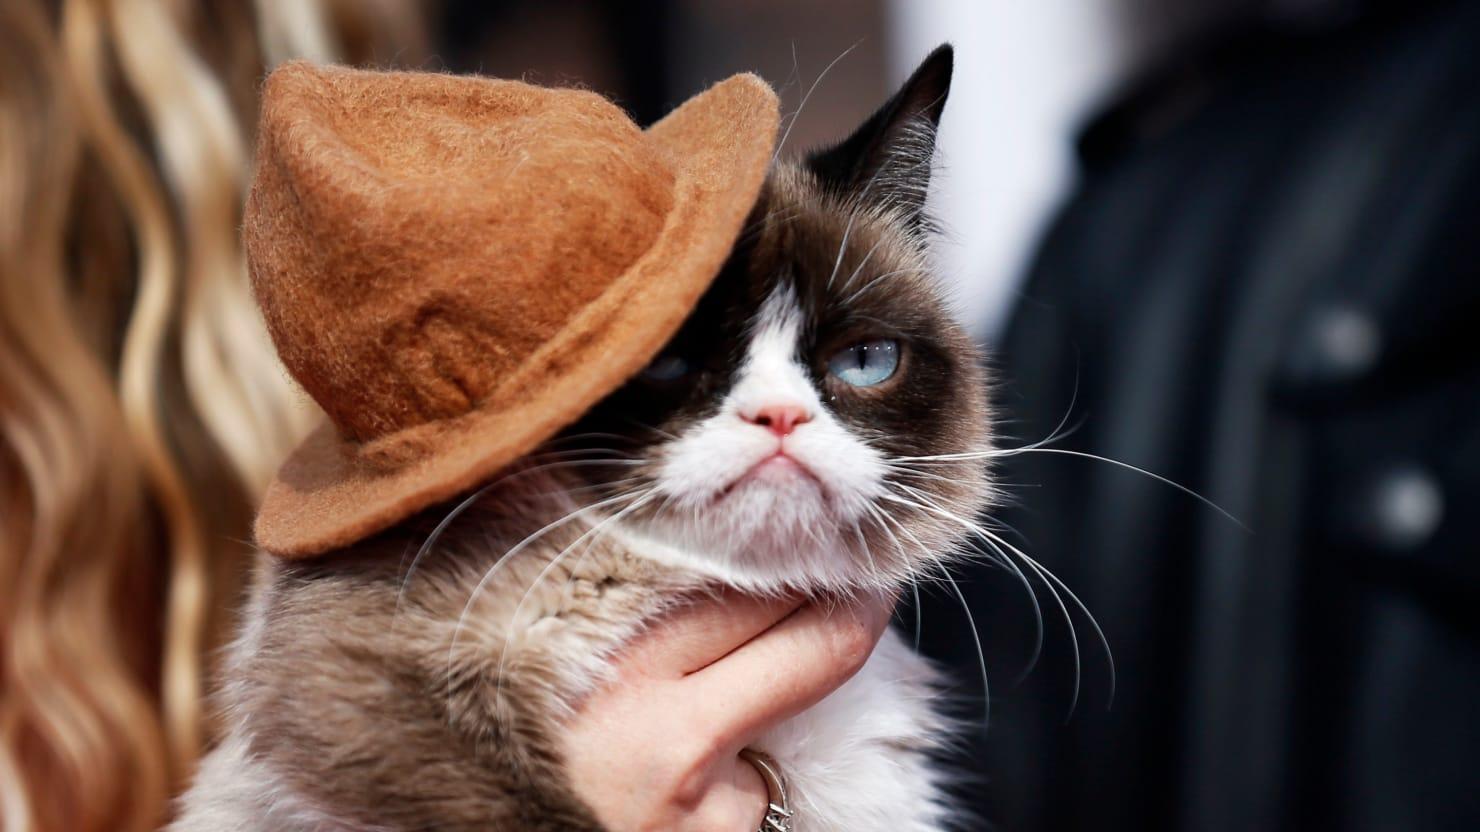 Grumpy Cat, Internet Sensation, Is Dead at Age 7